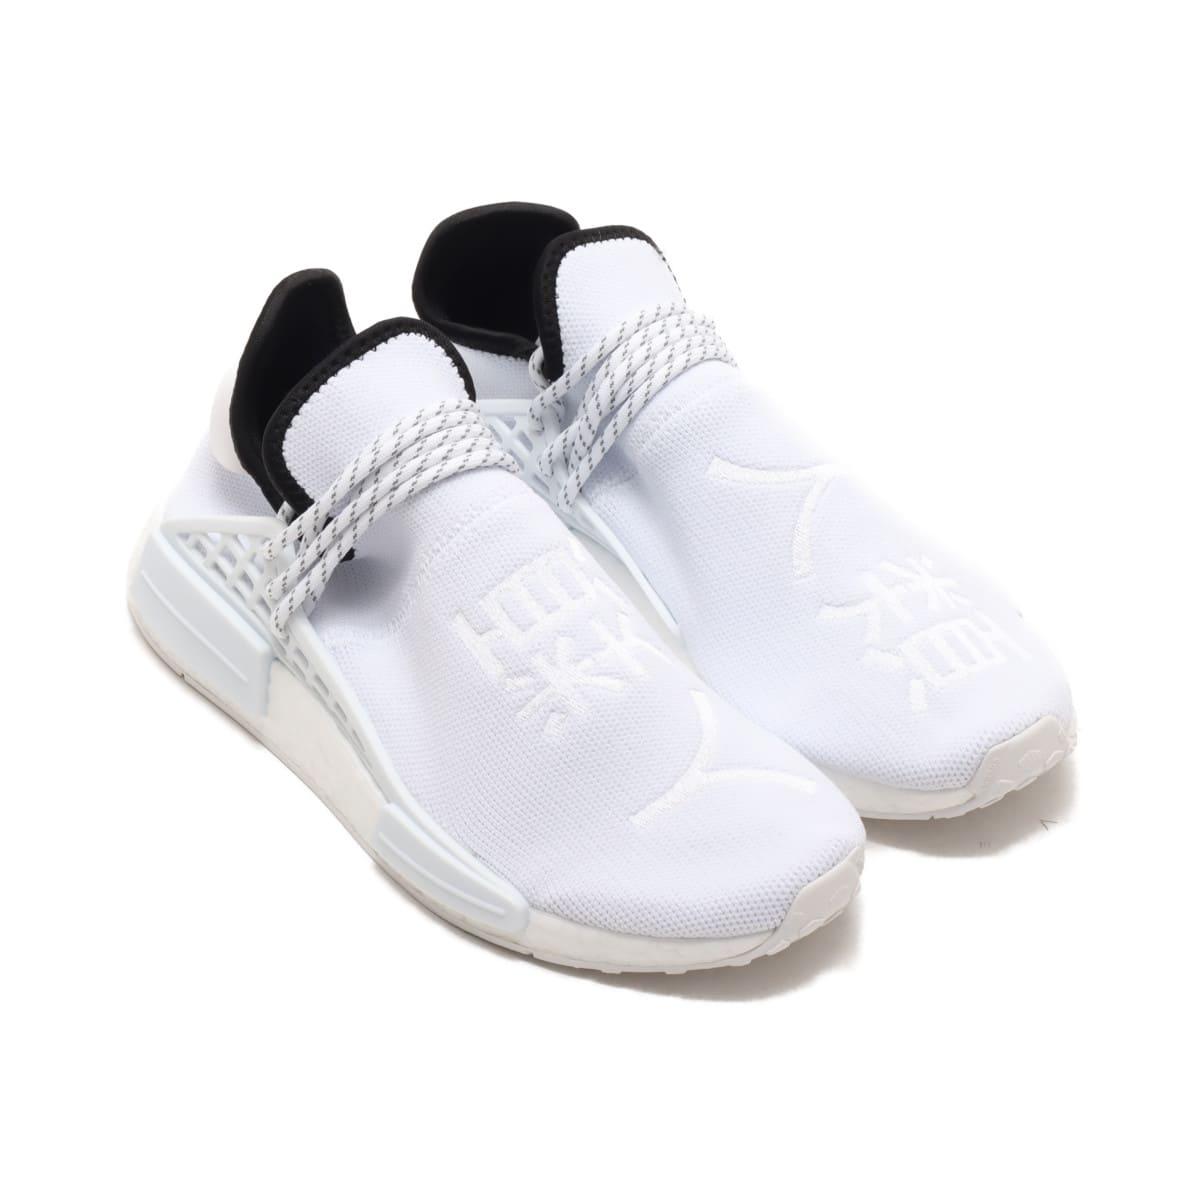 adidas HU NMD CORE WHITE/CORE WHITE/CORE BLACK 20FW-S_photo_large